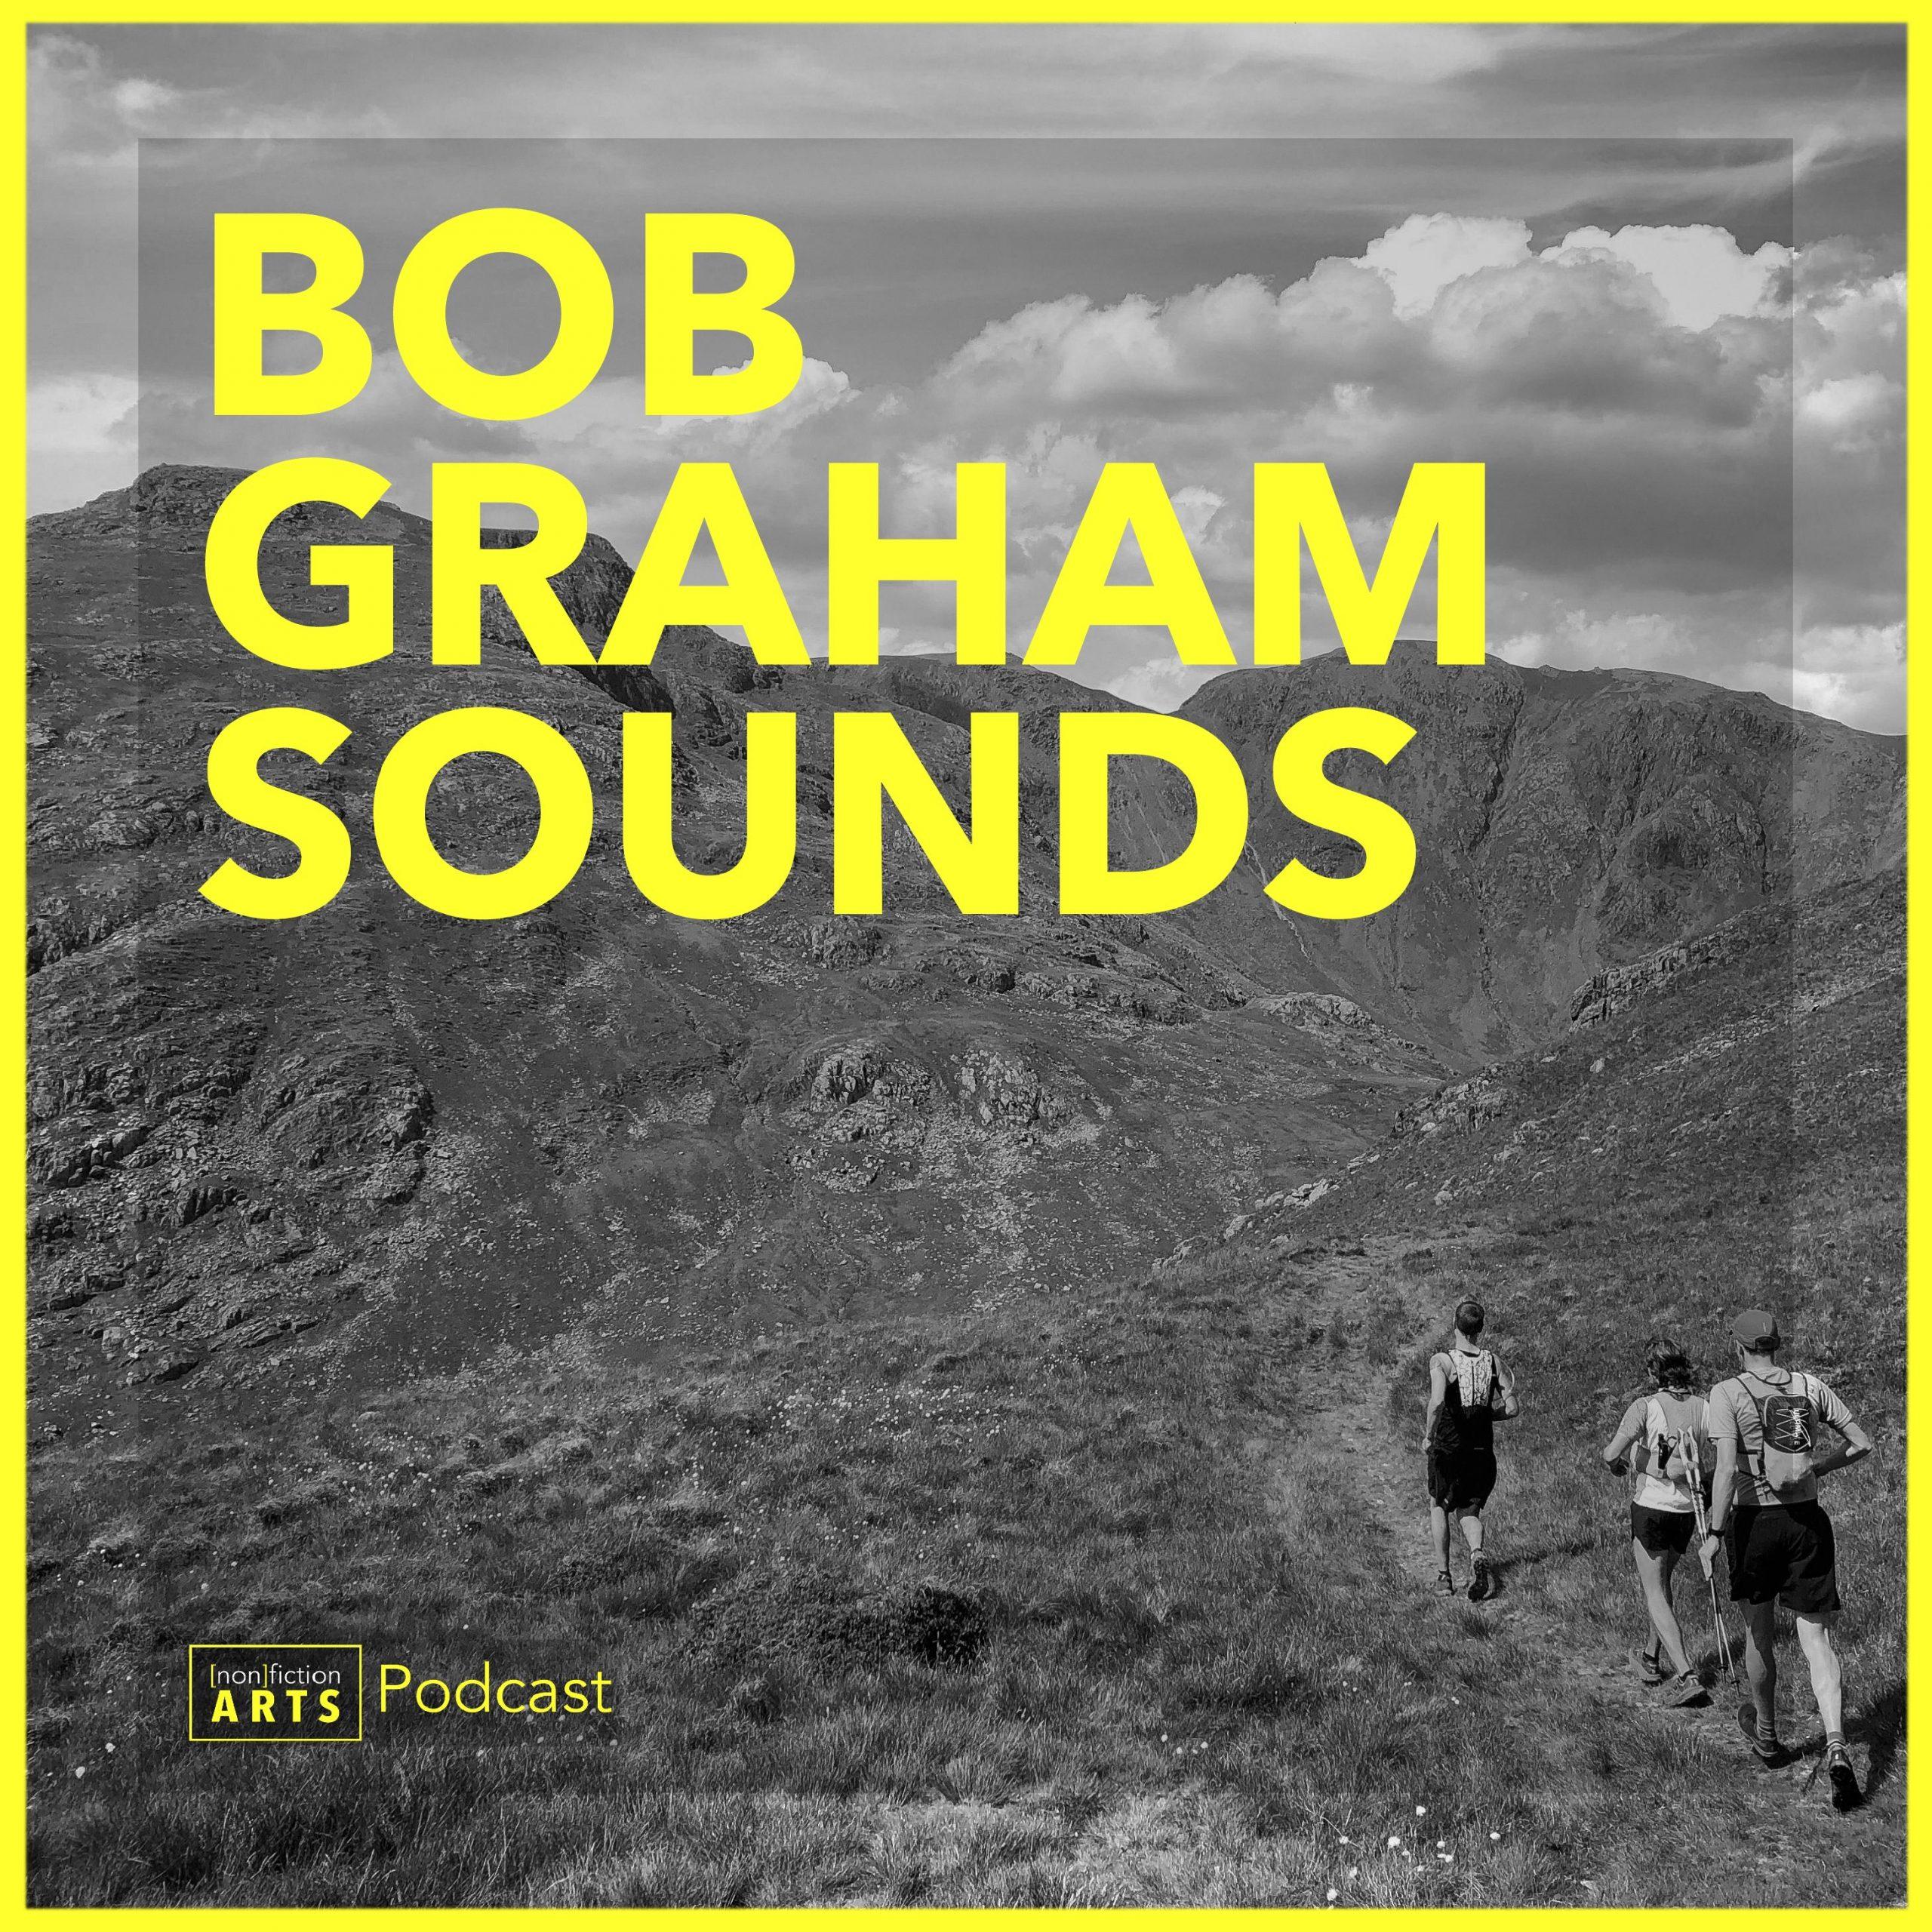 Episode 11c: Bob Graham Zooms